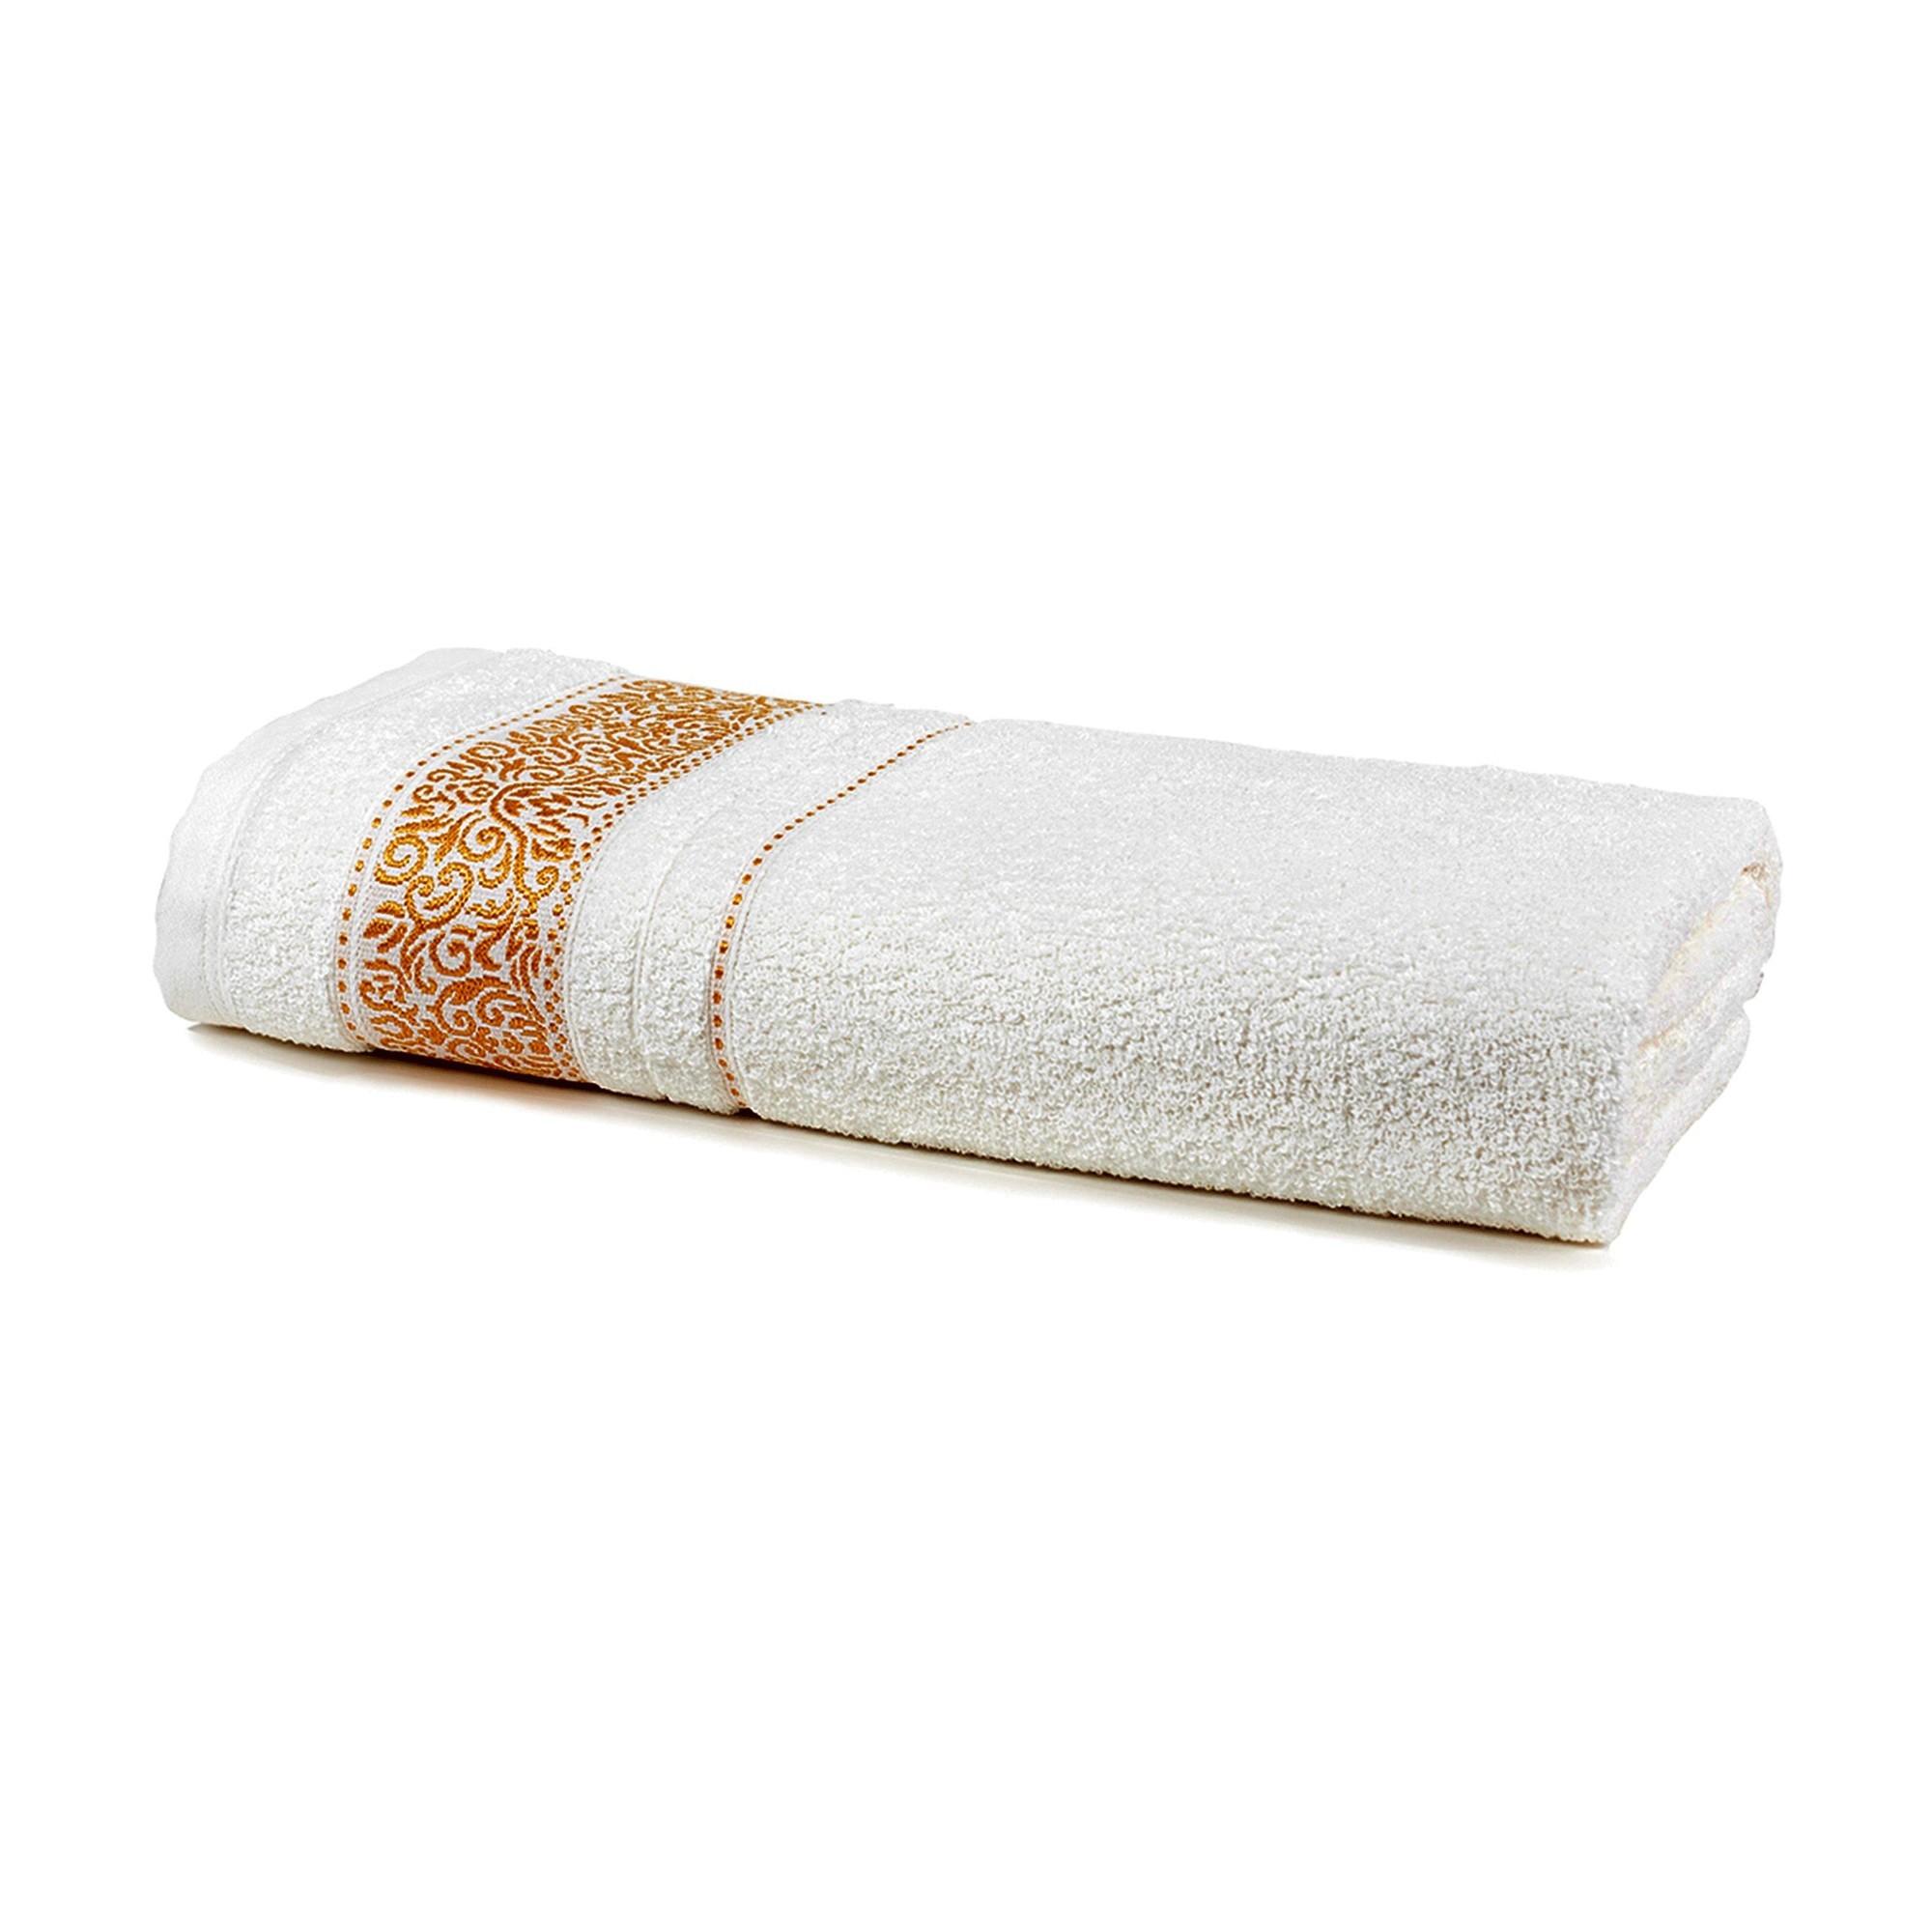 Toalha de Rosto Unique 100 Algodao 50x70 cm Branco - Santista